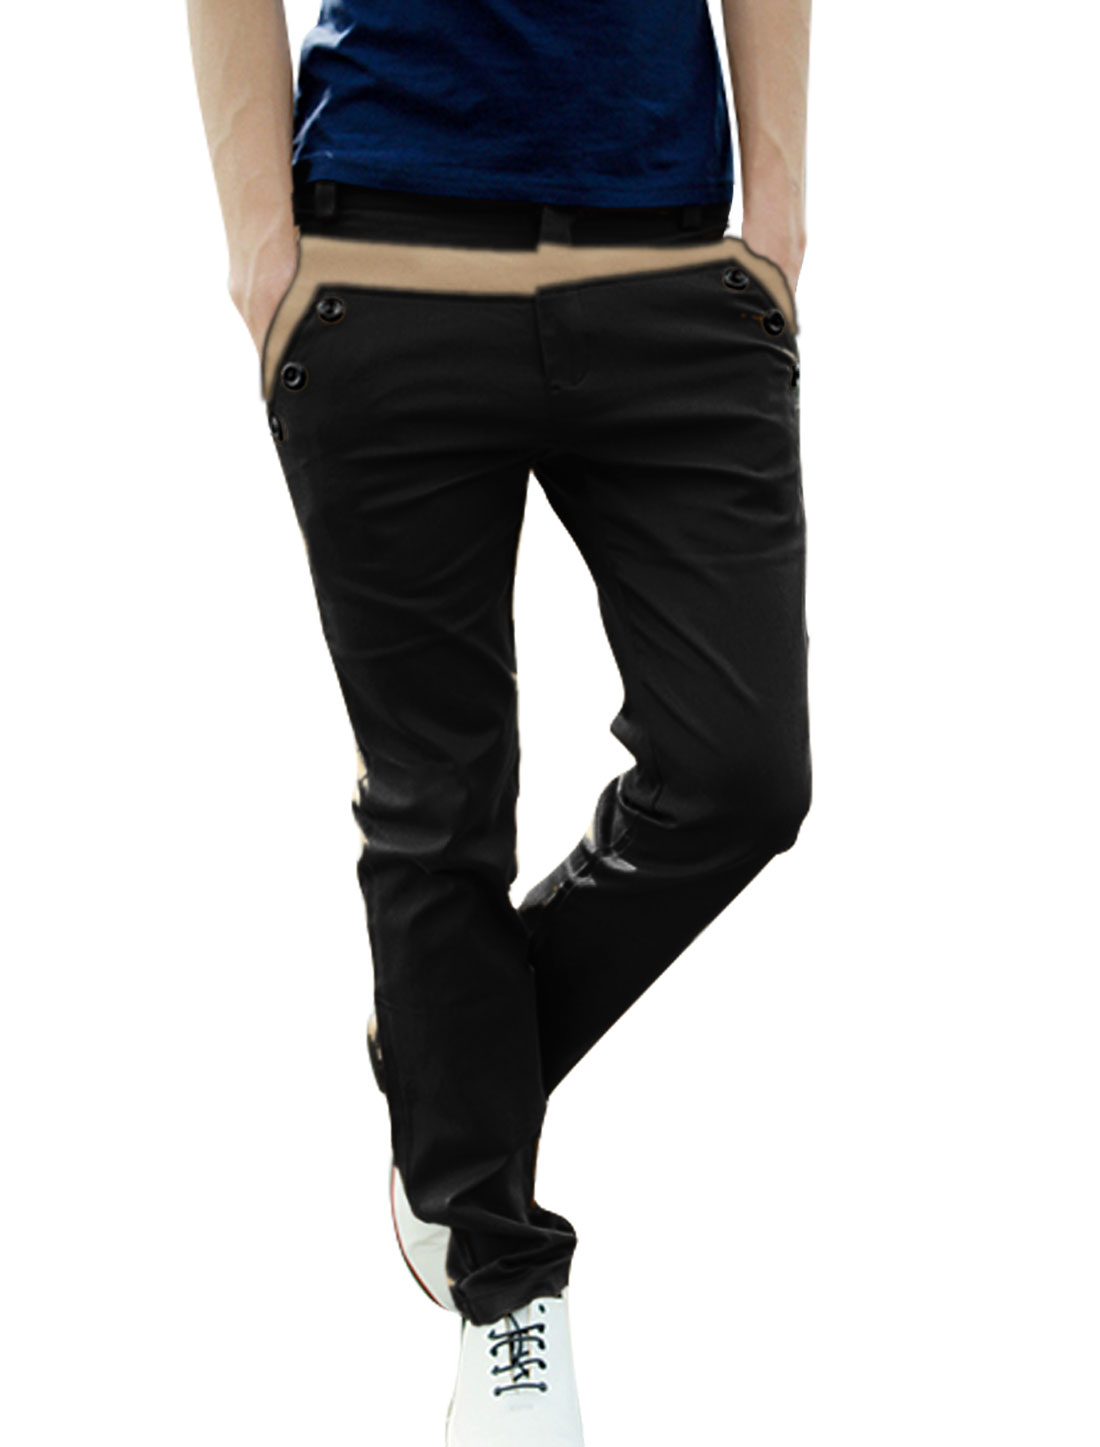 Men W32 Black Belt Loop Zipper Fly Front Button Closure Pants Trousers